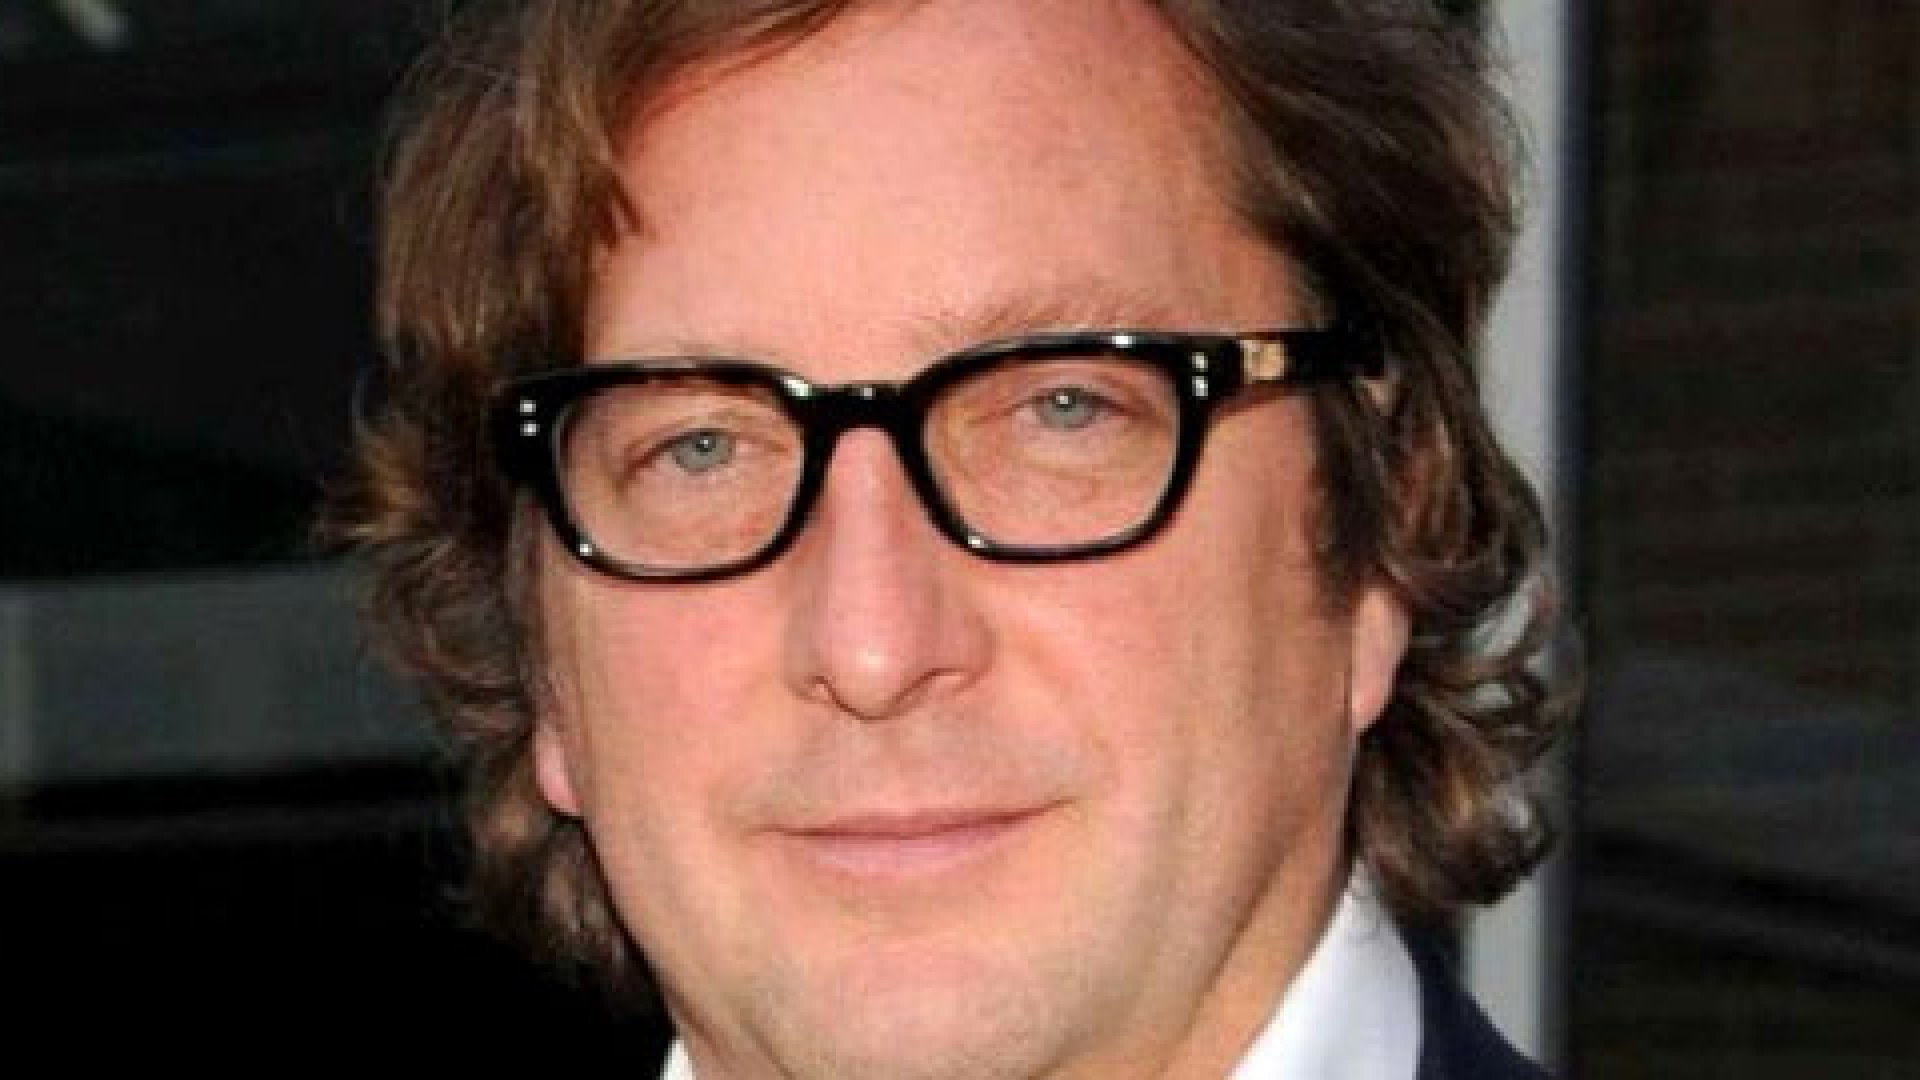 Billionaire hedge fund manager Philip Falcone